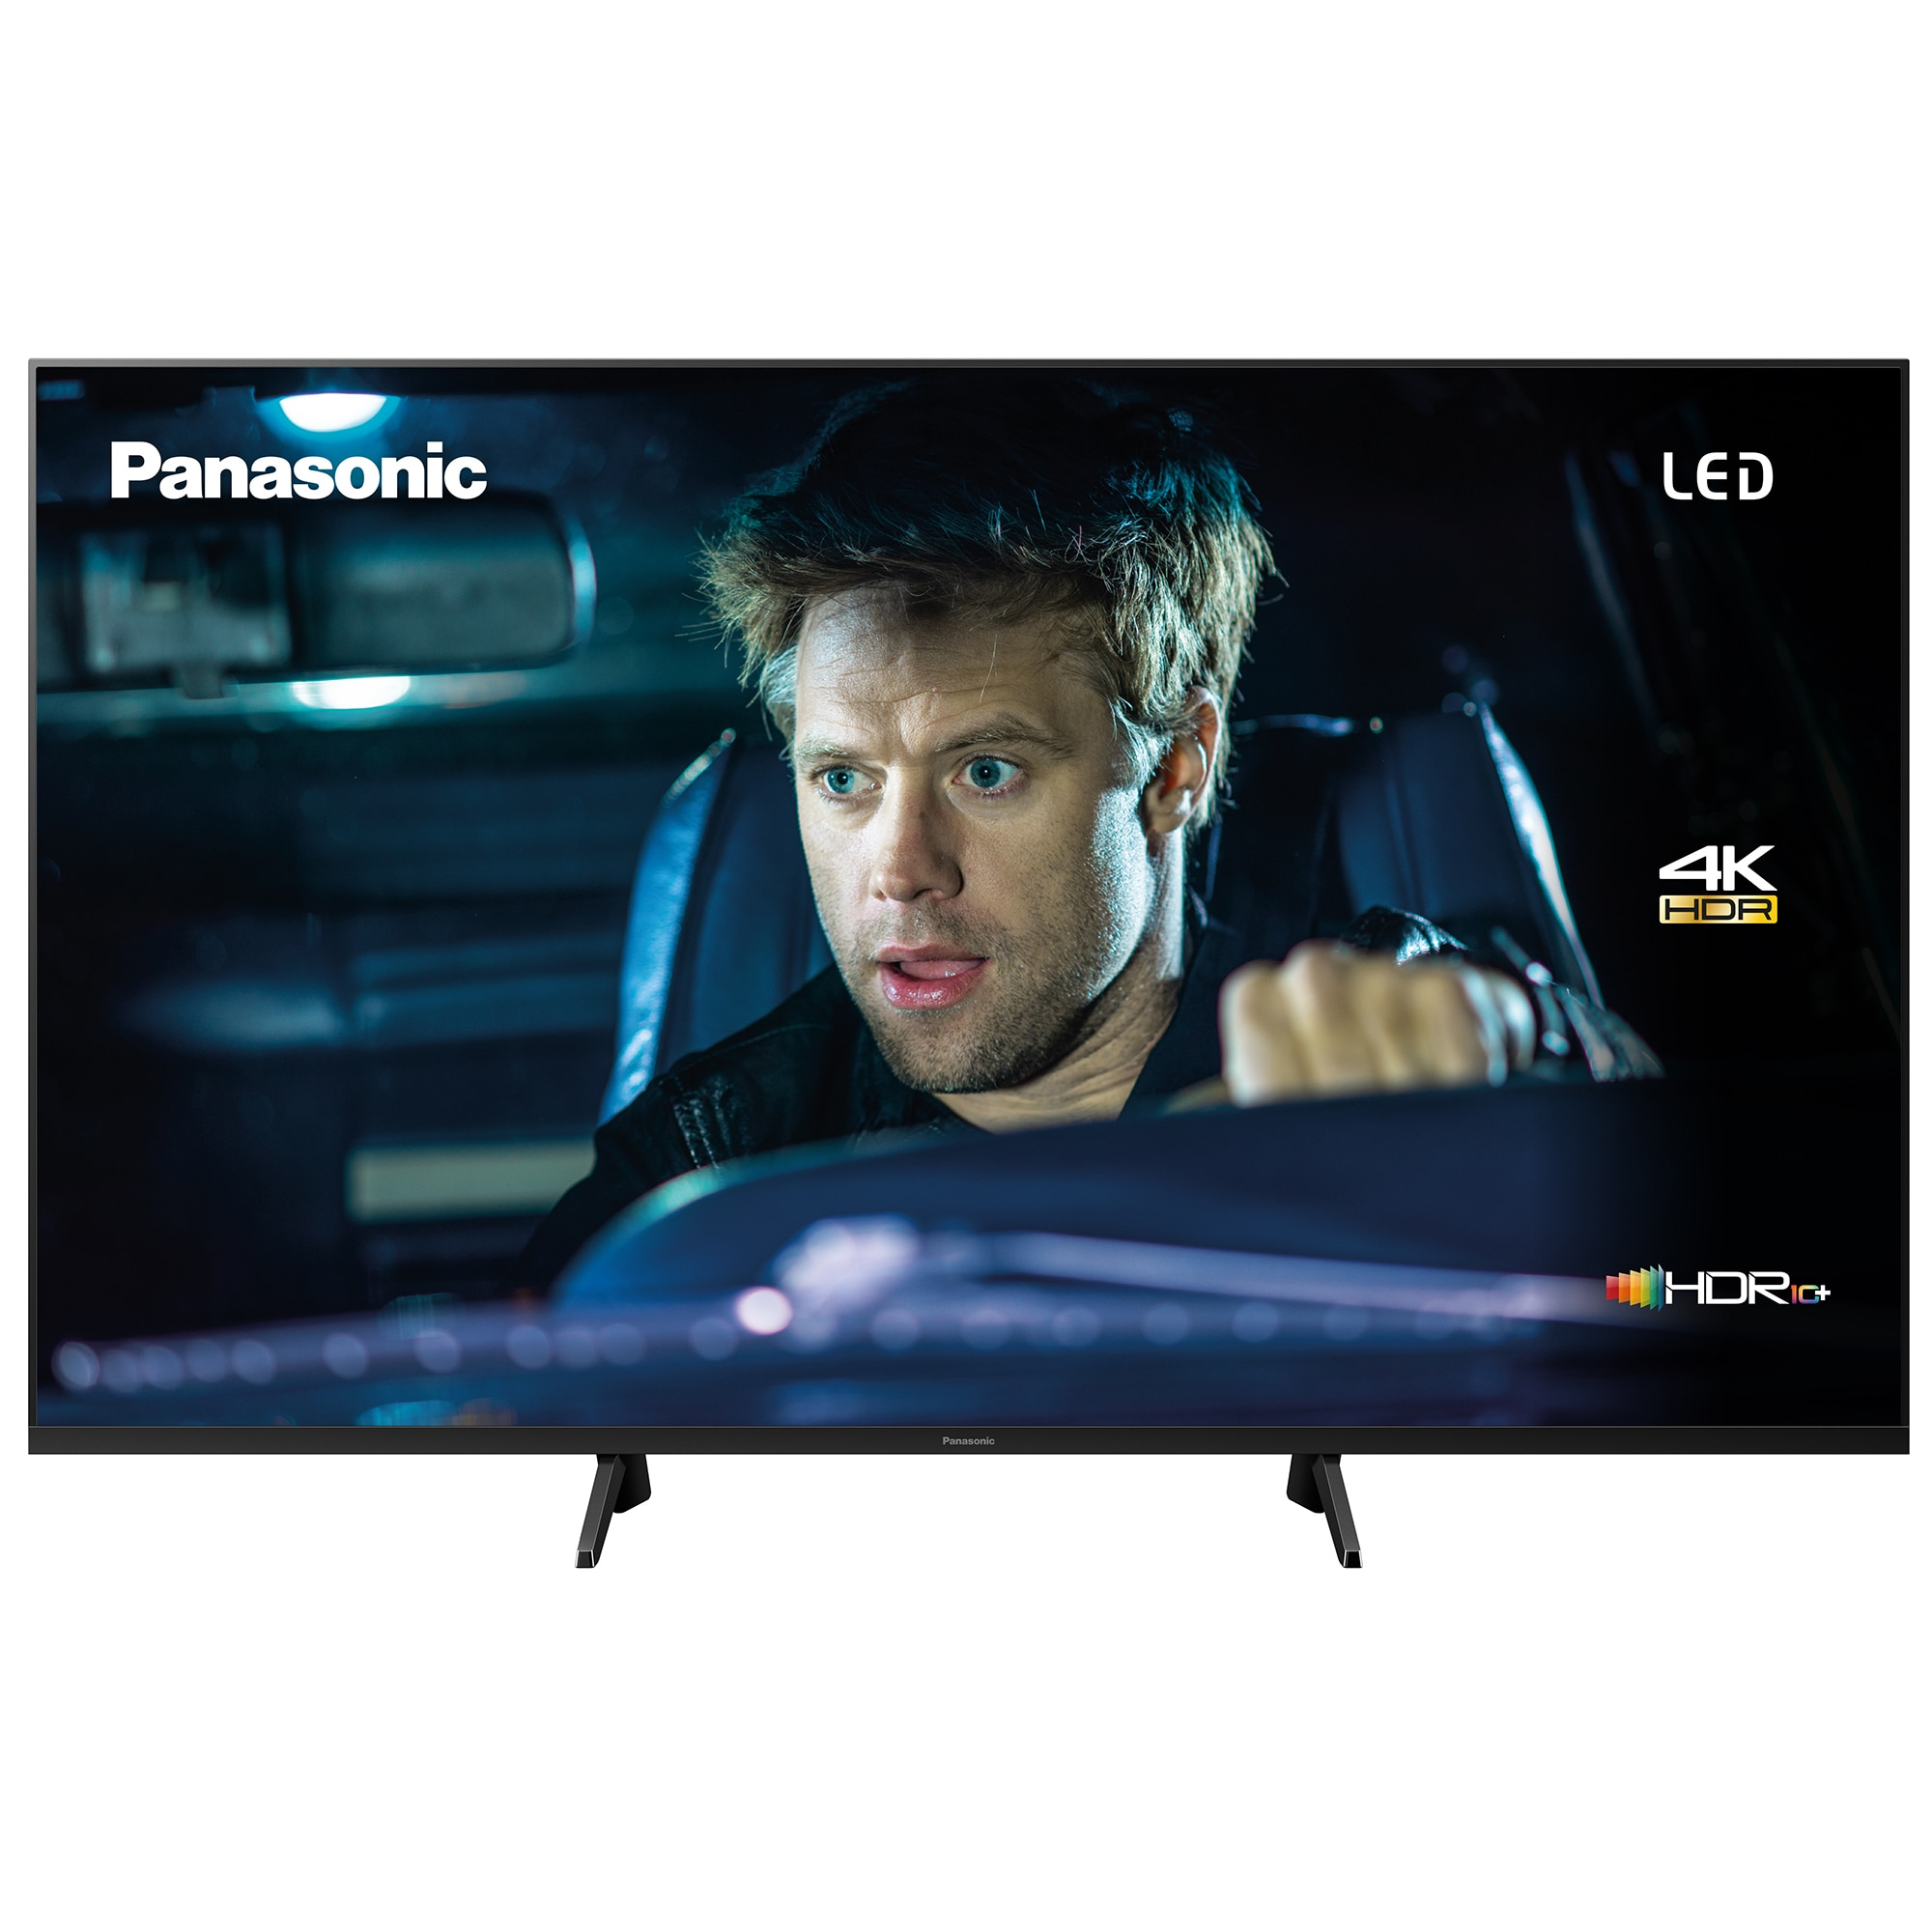 Fotografie Televizor LED Smart Panasonic, 126 cm, TX-50GX700E, 4K Ultra HD, Clasa A+